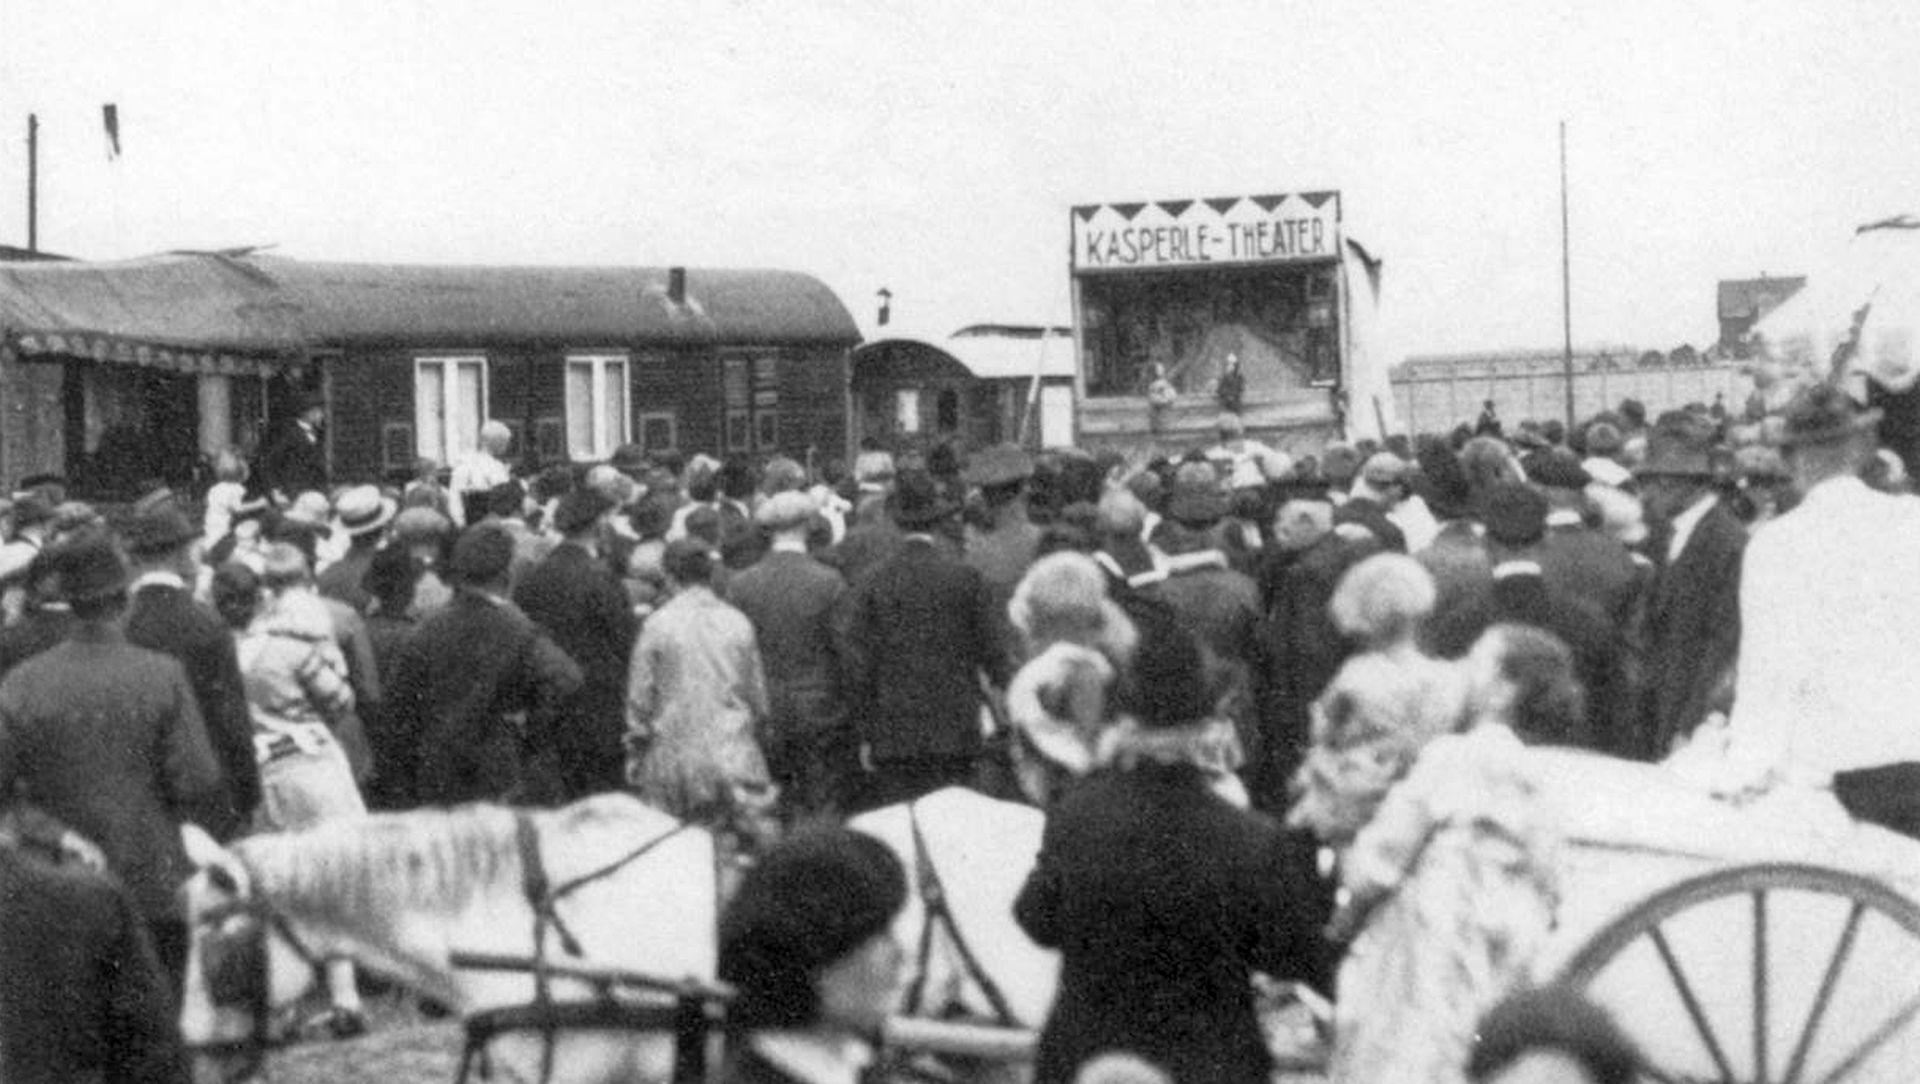 Publikumsmagnet Kasperle-Theater, 1920er Jahre.jpg